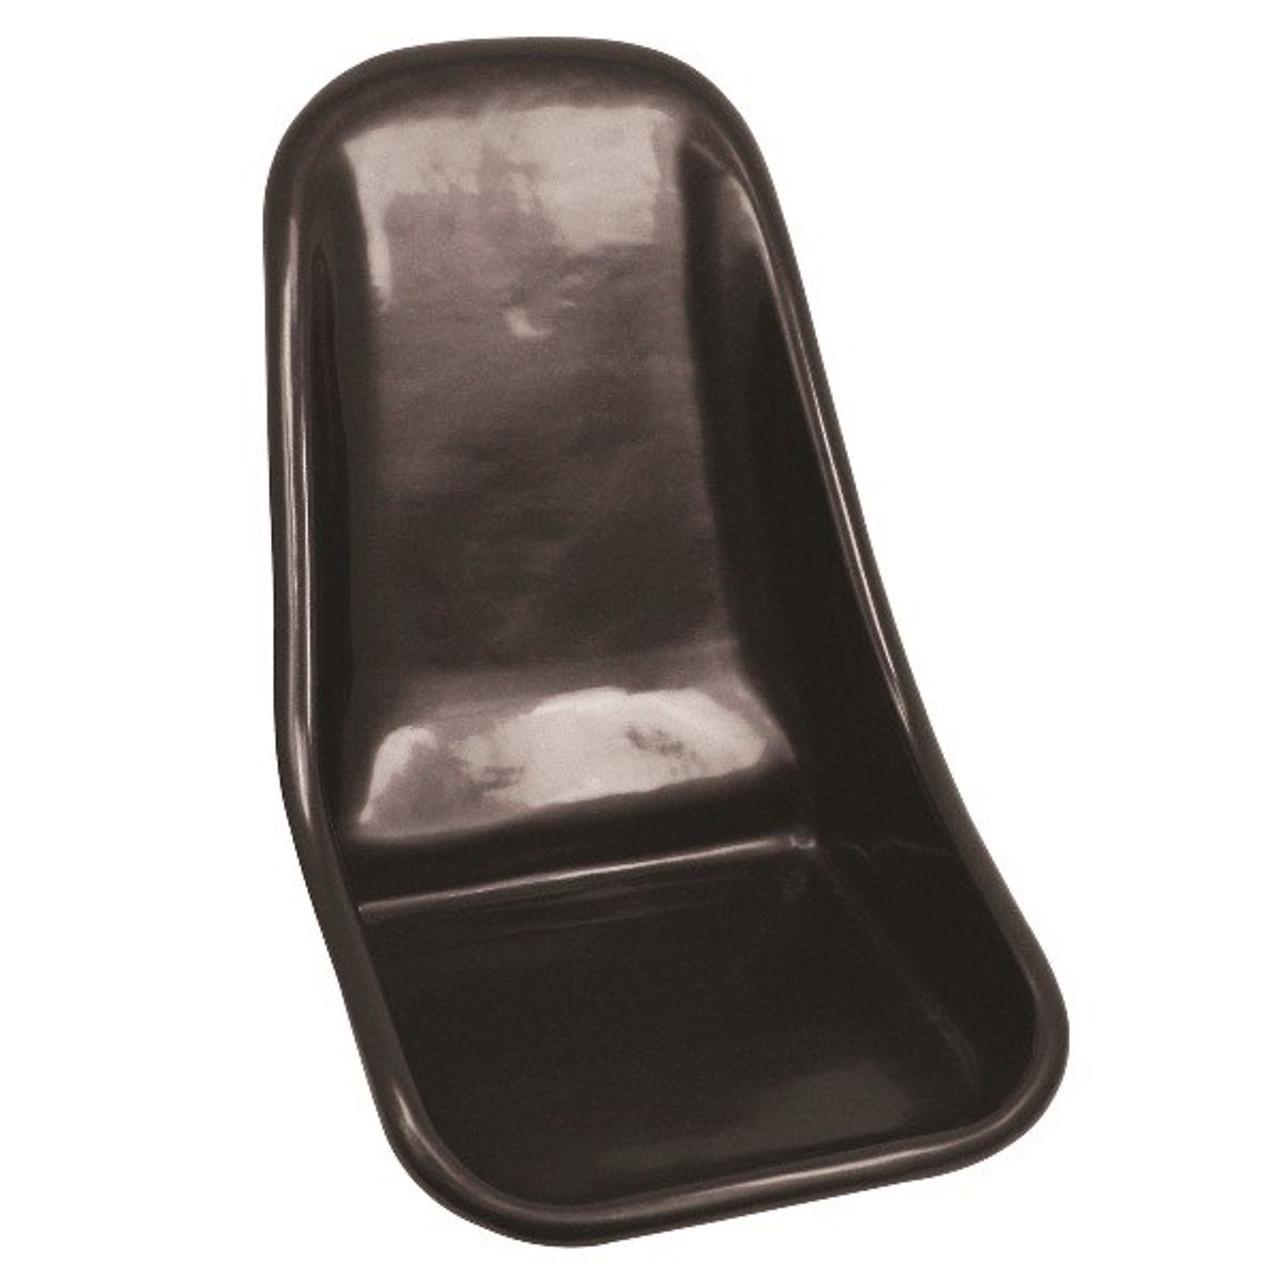 Empi 62-2613 Grey Vinyl Low Back Bucket Seat Cover Each Dune Buggy Vw Baja Bug